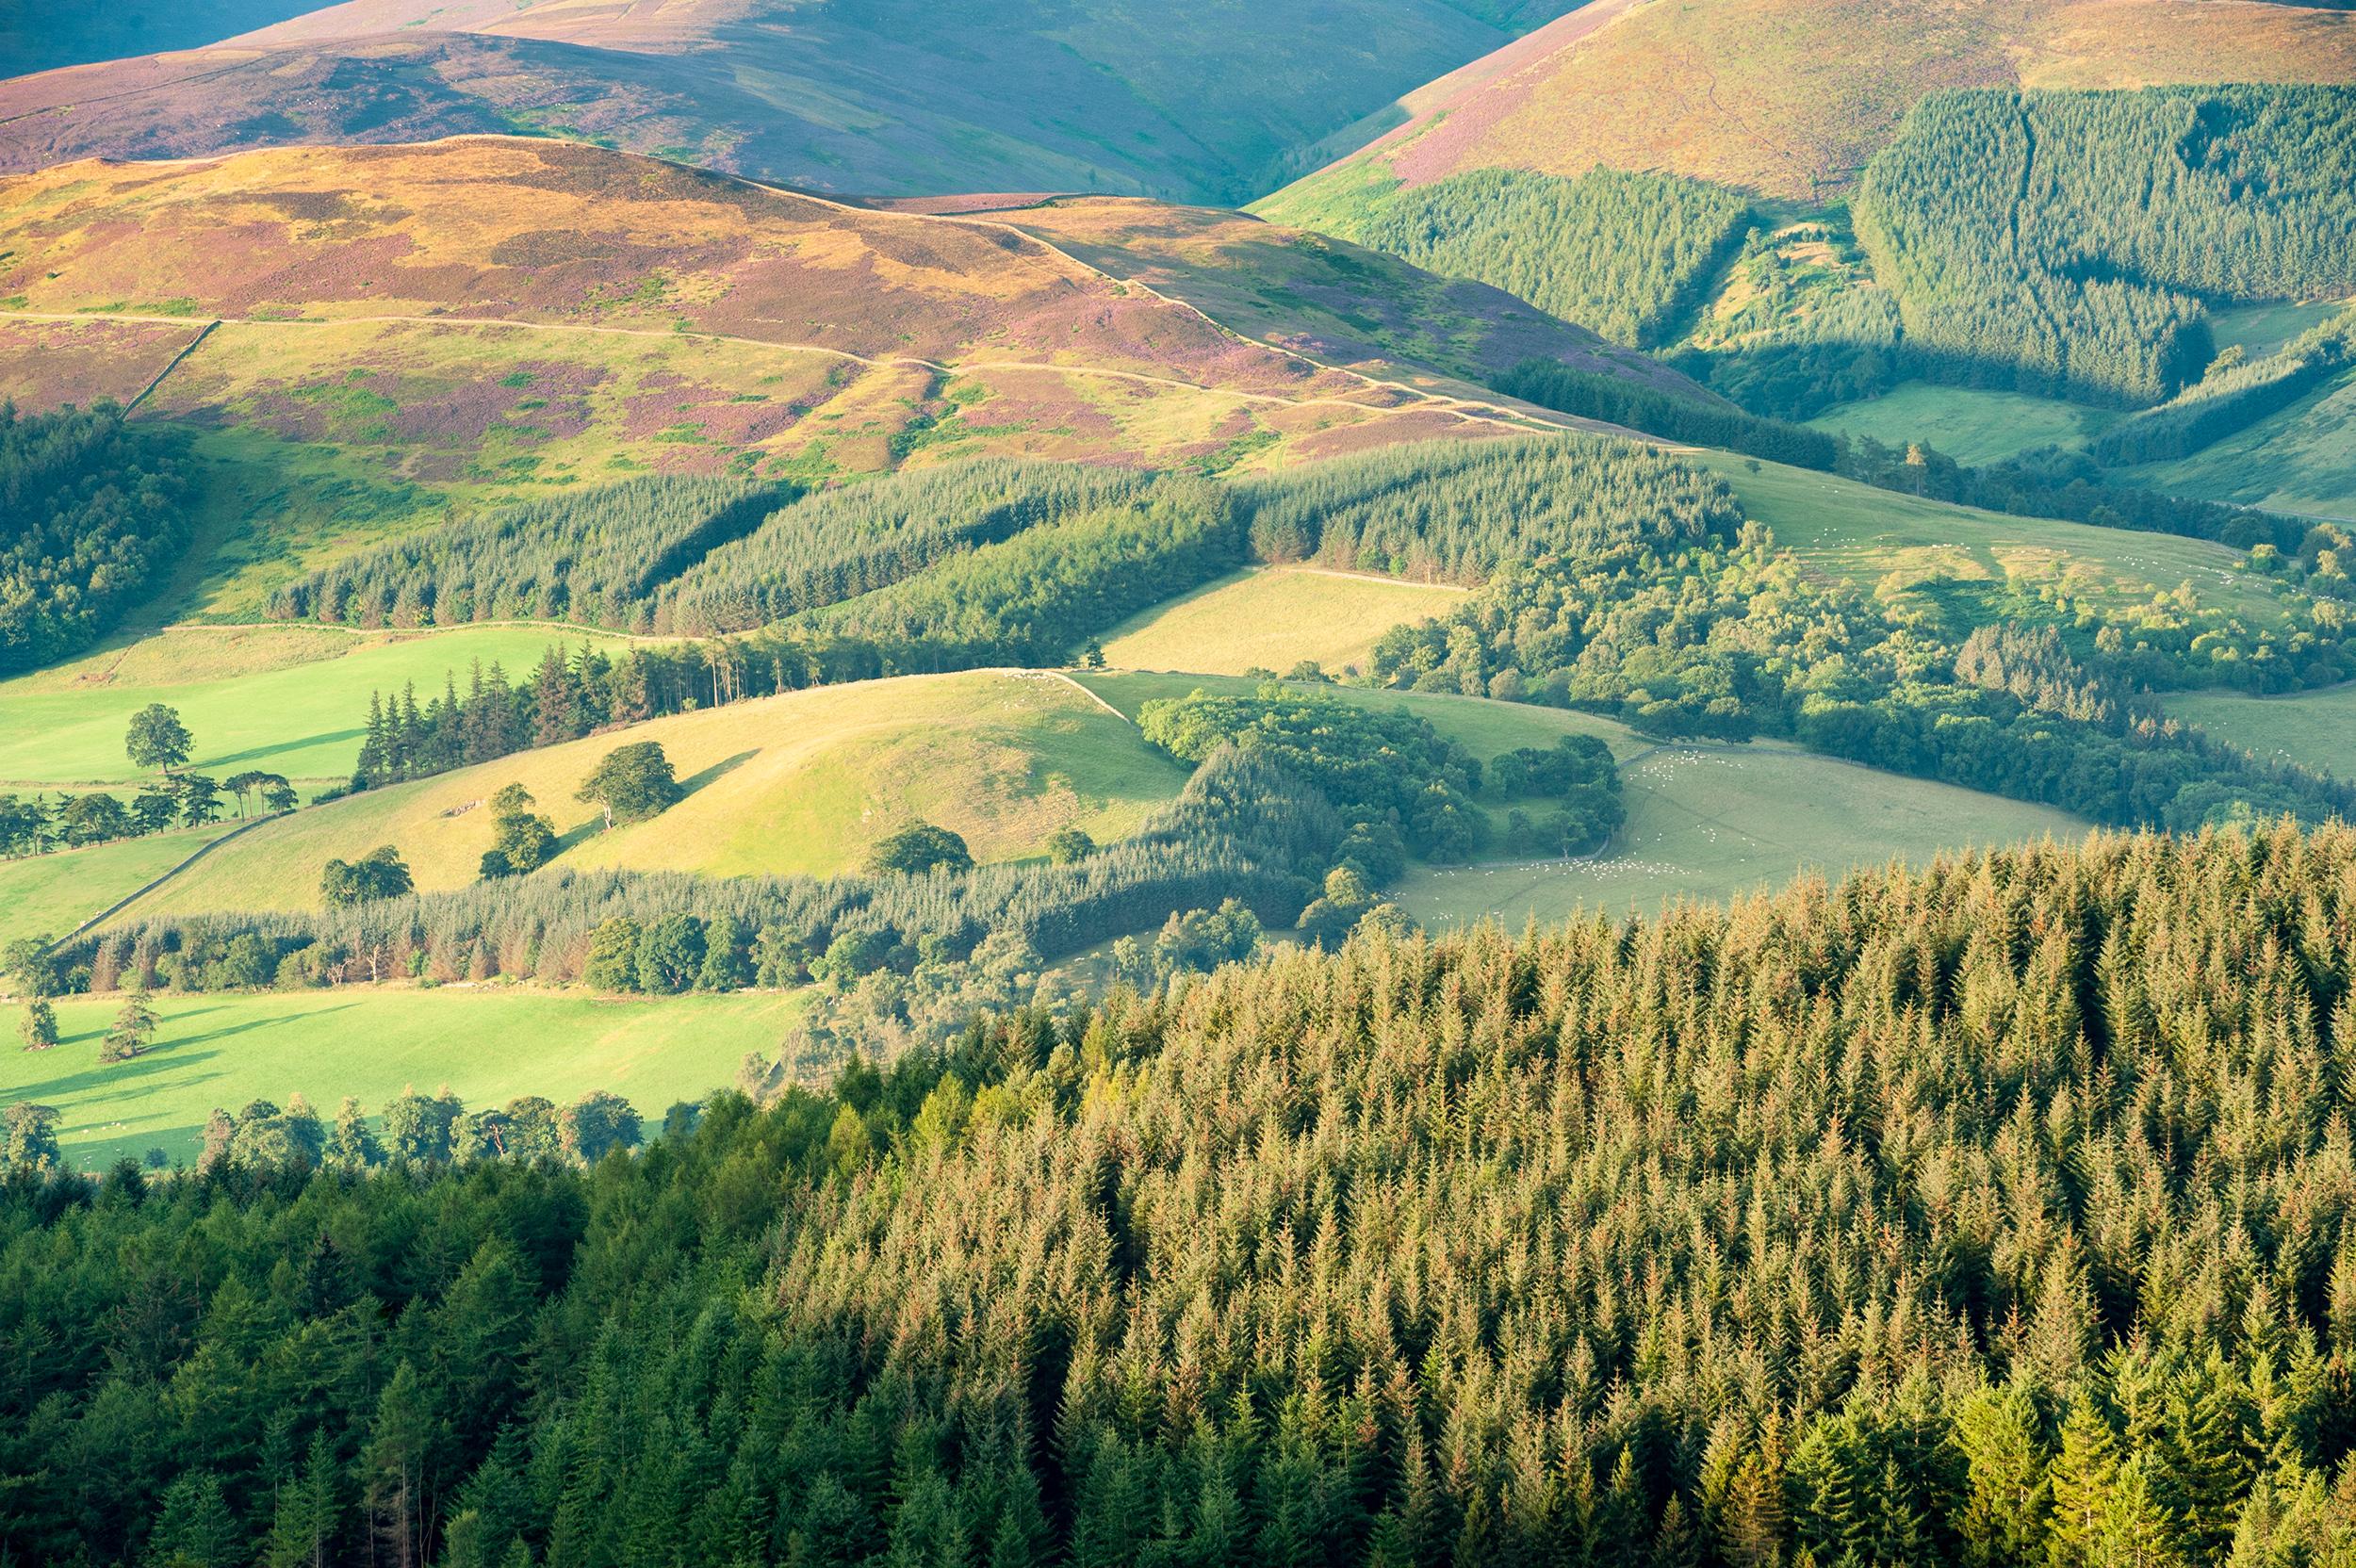 Near Peebles, Tweed Valley, Scotland